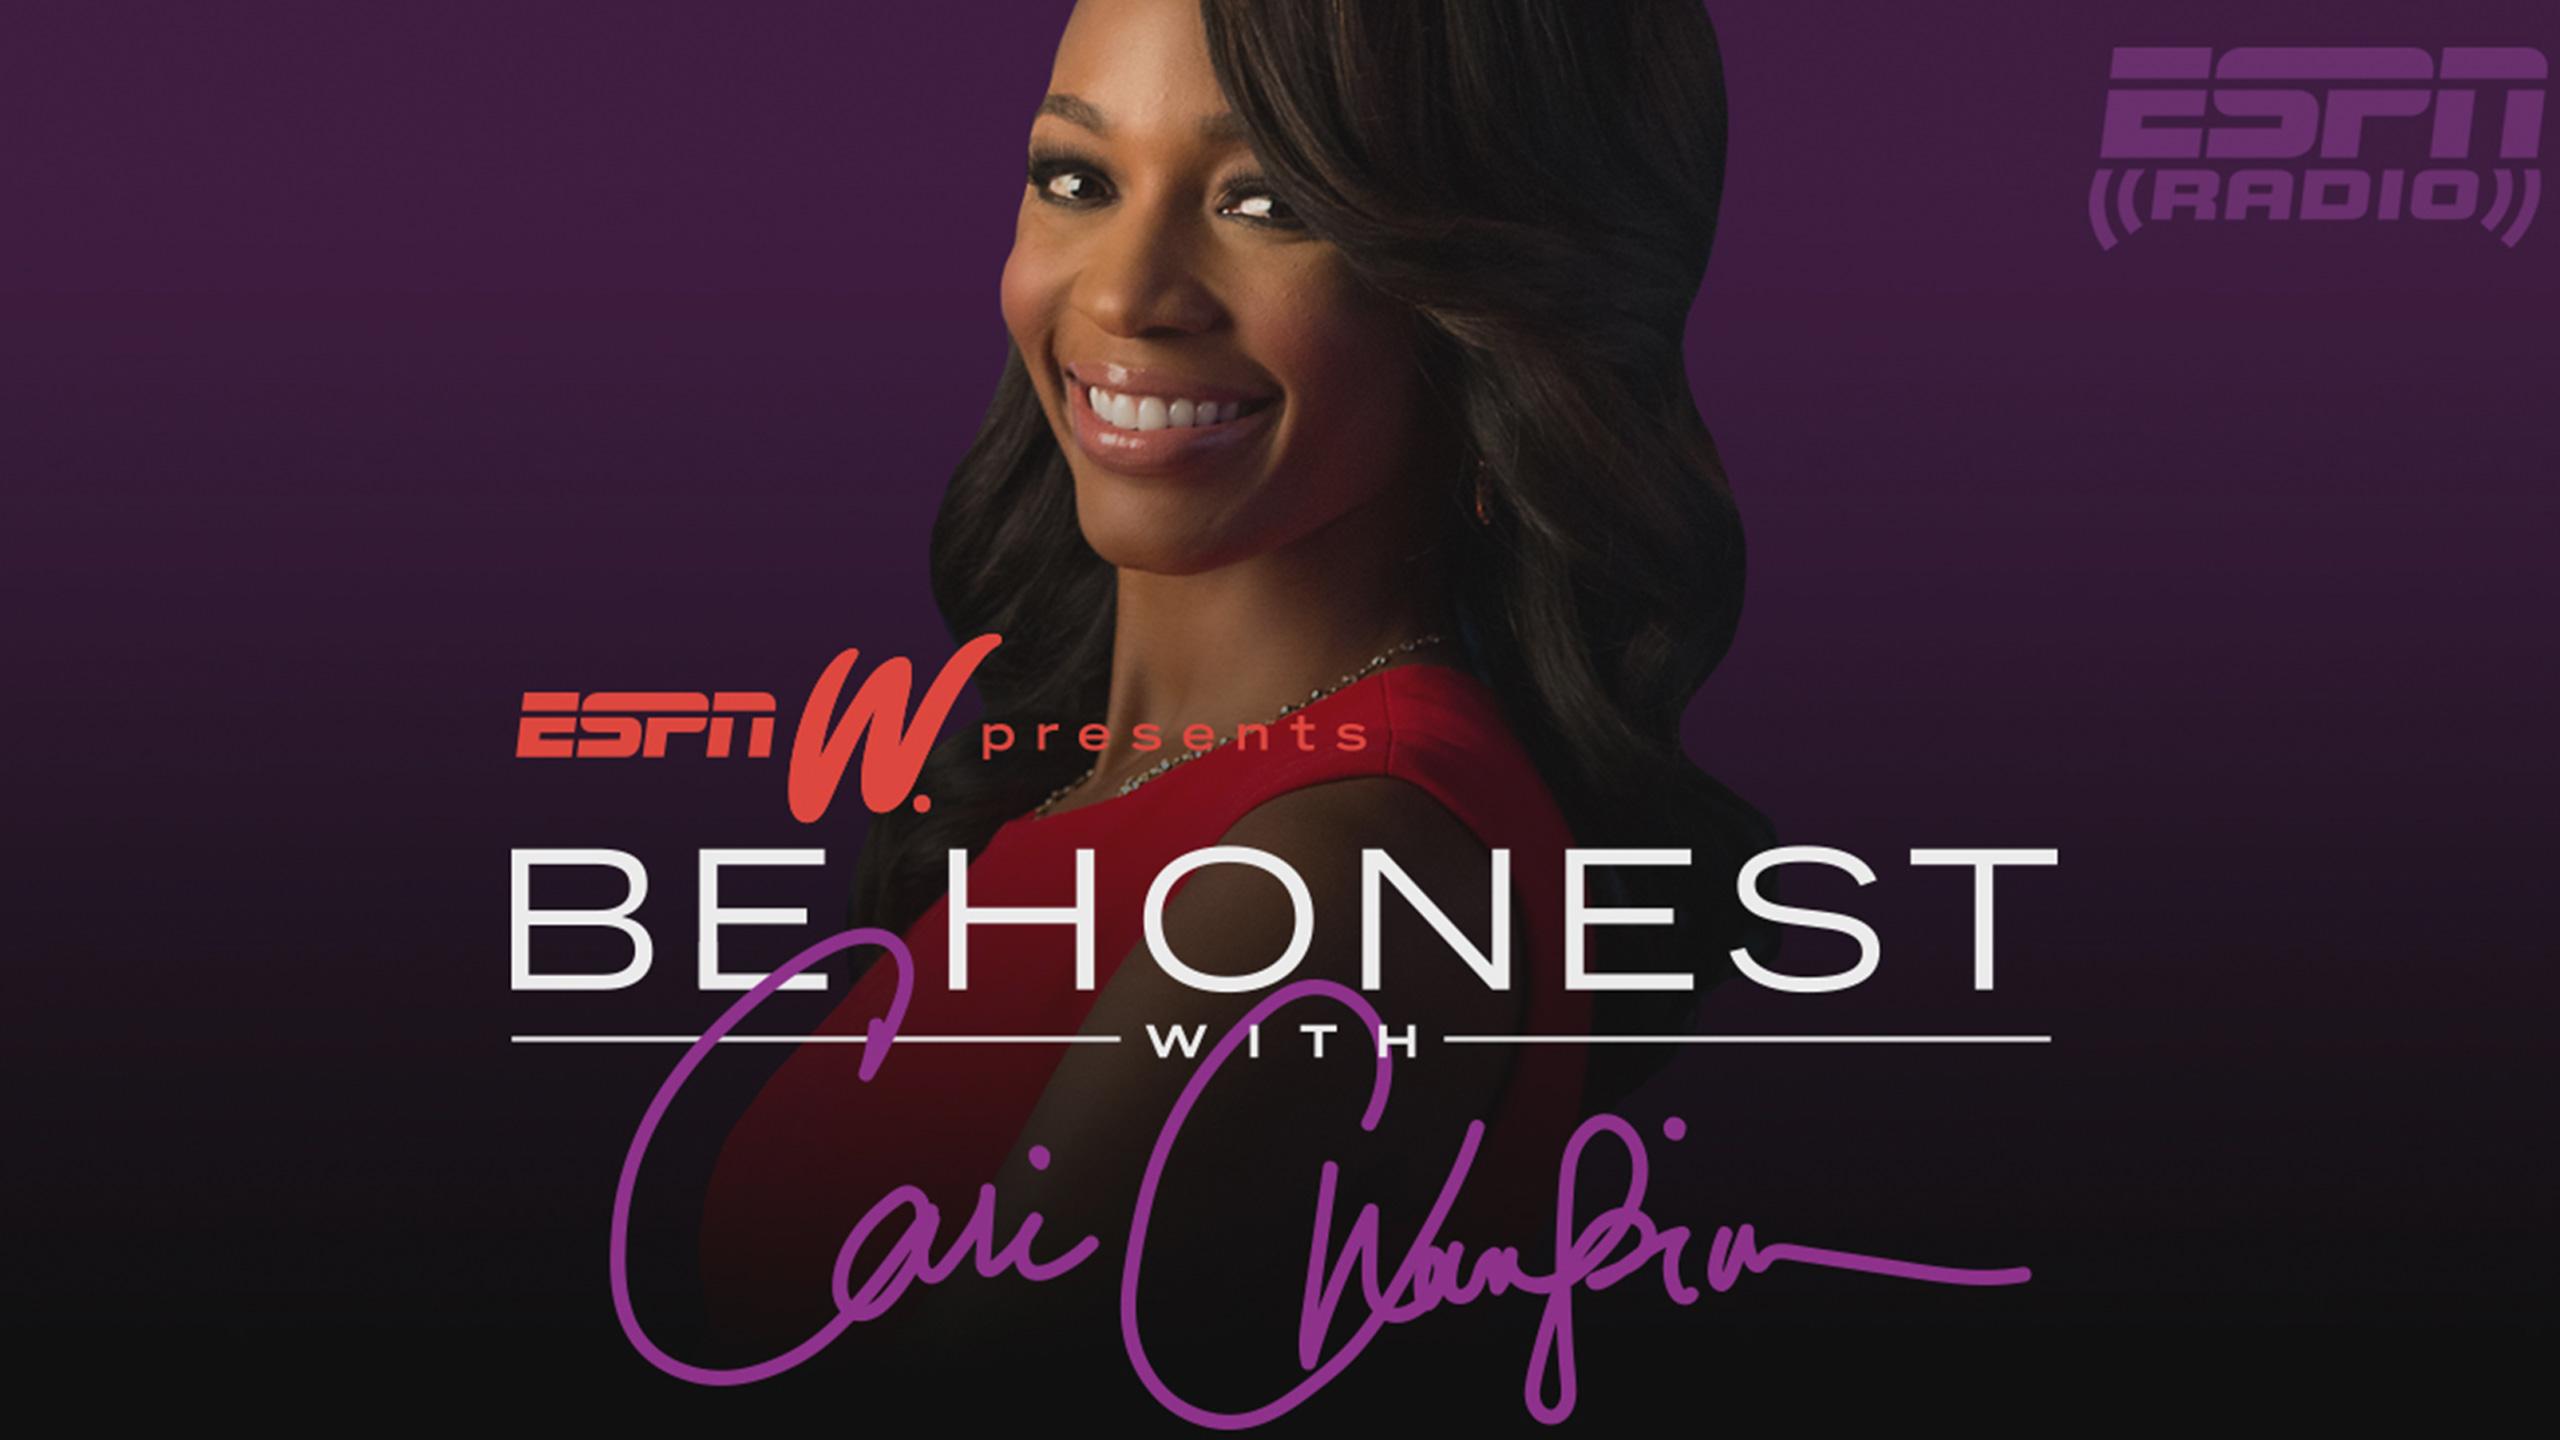 Tue, 3/13 - Be Honest with Cari Champion: Josh Duhamel